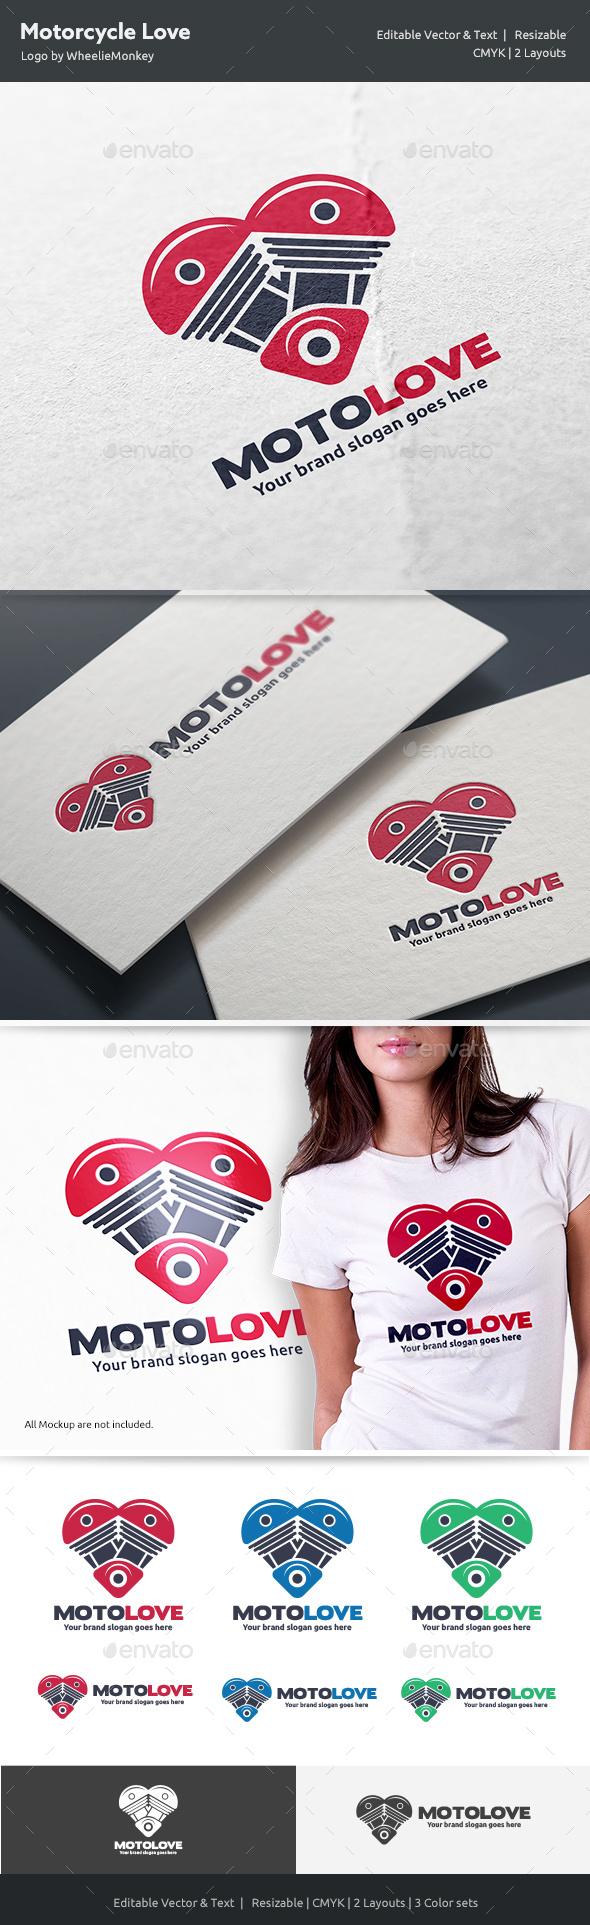 Motorcycle Love Logo - Vector Abstract